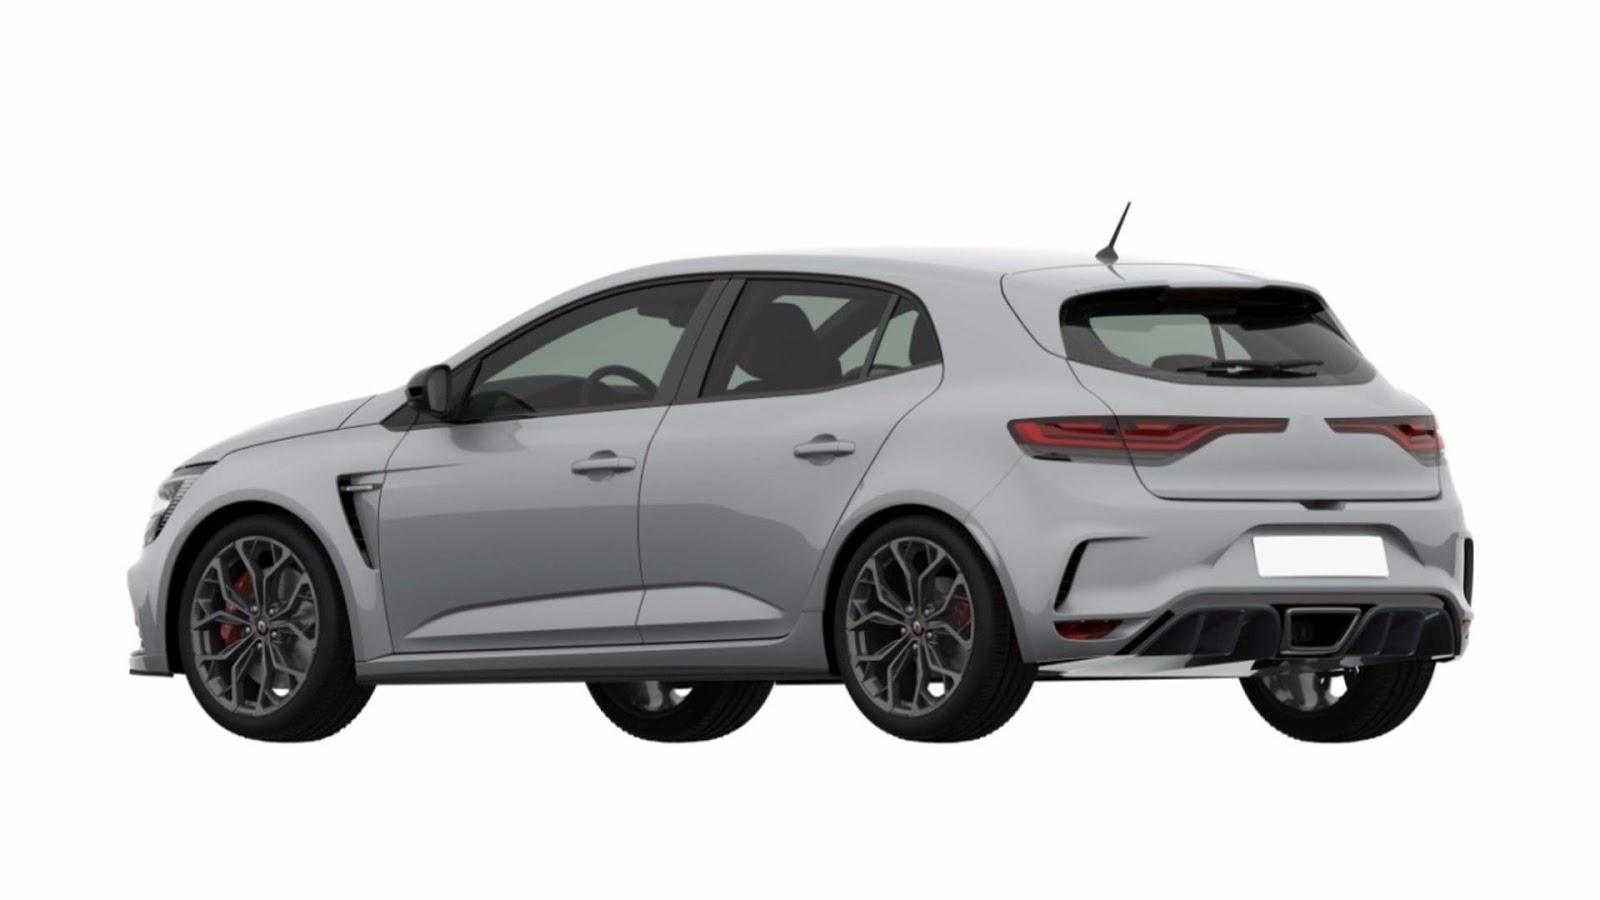 2018-Renault-Megane-RS-4